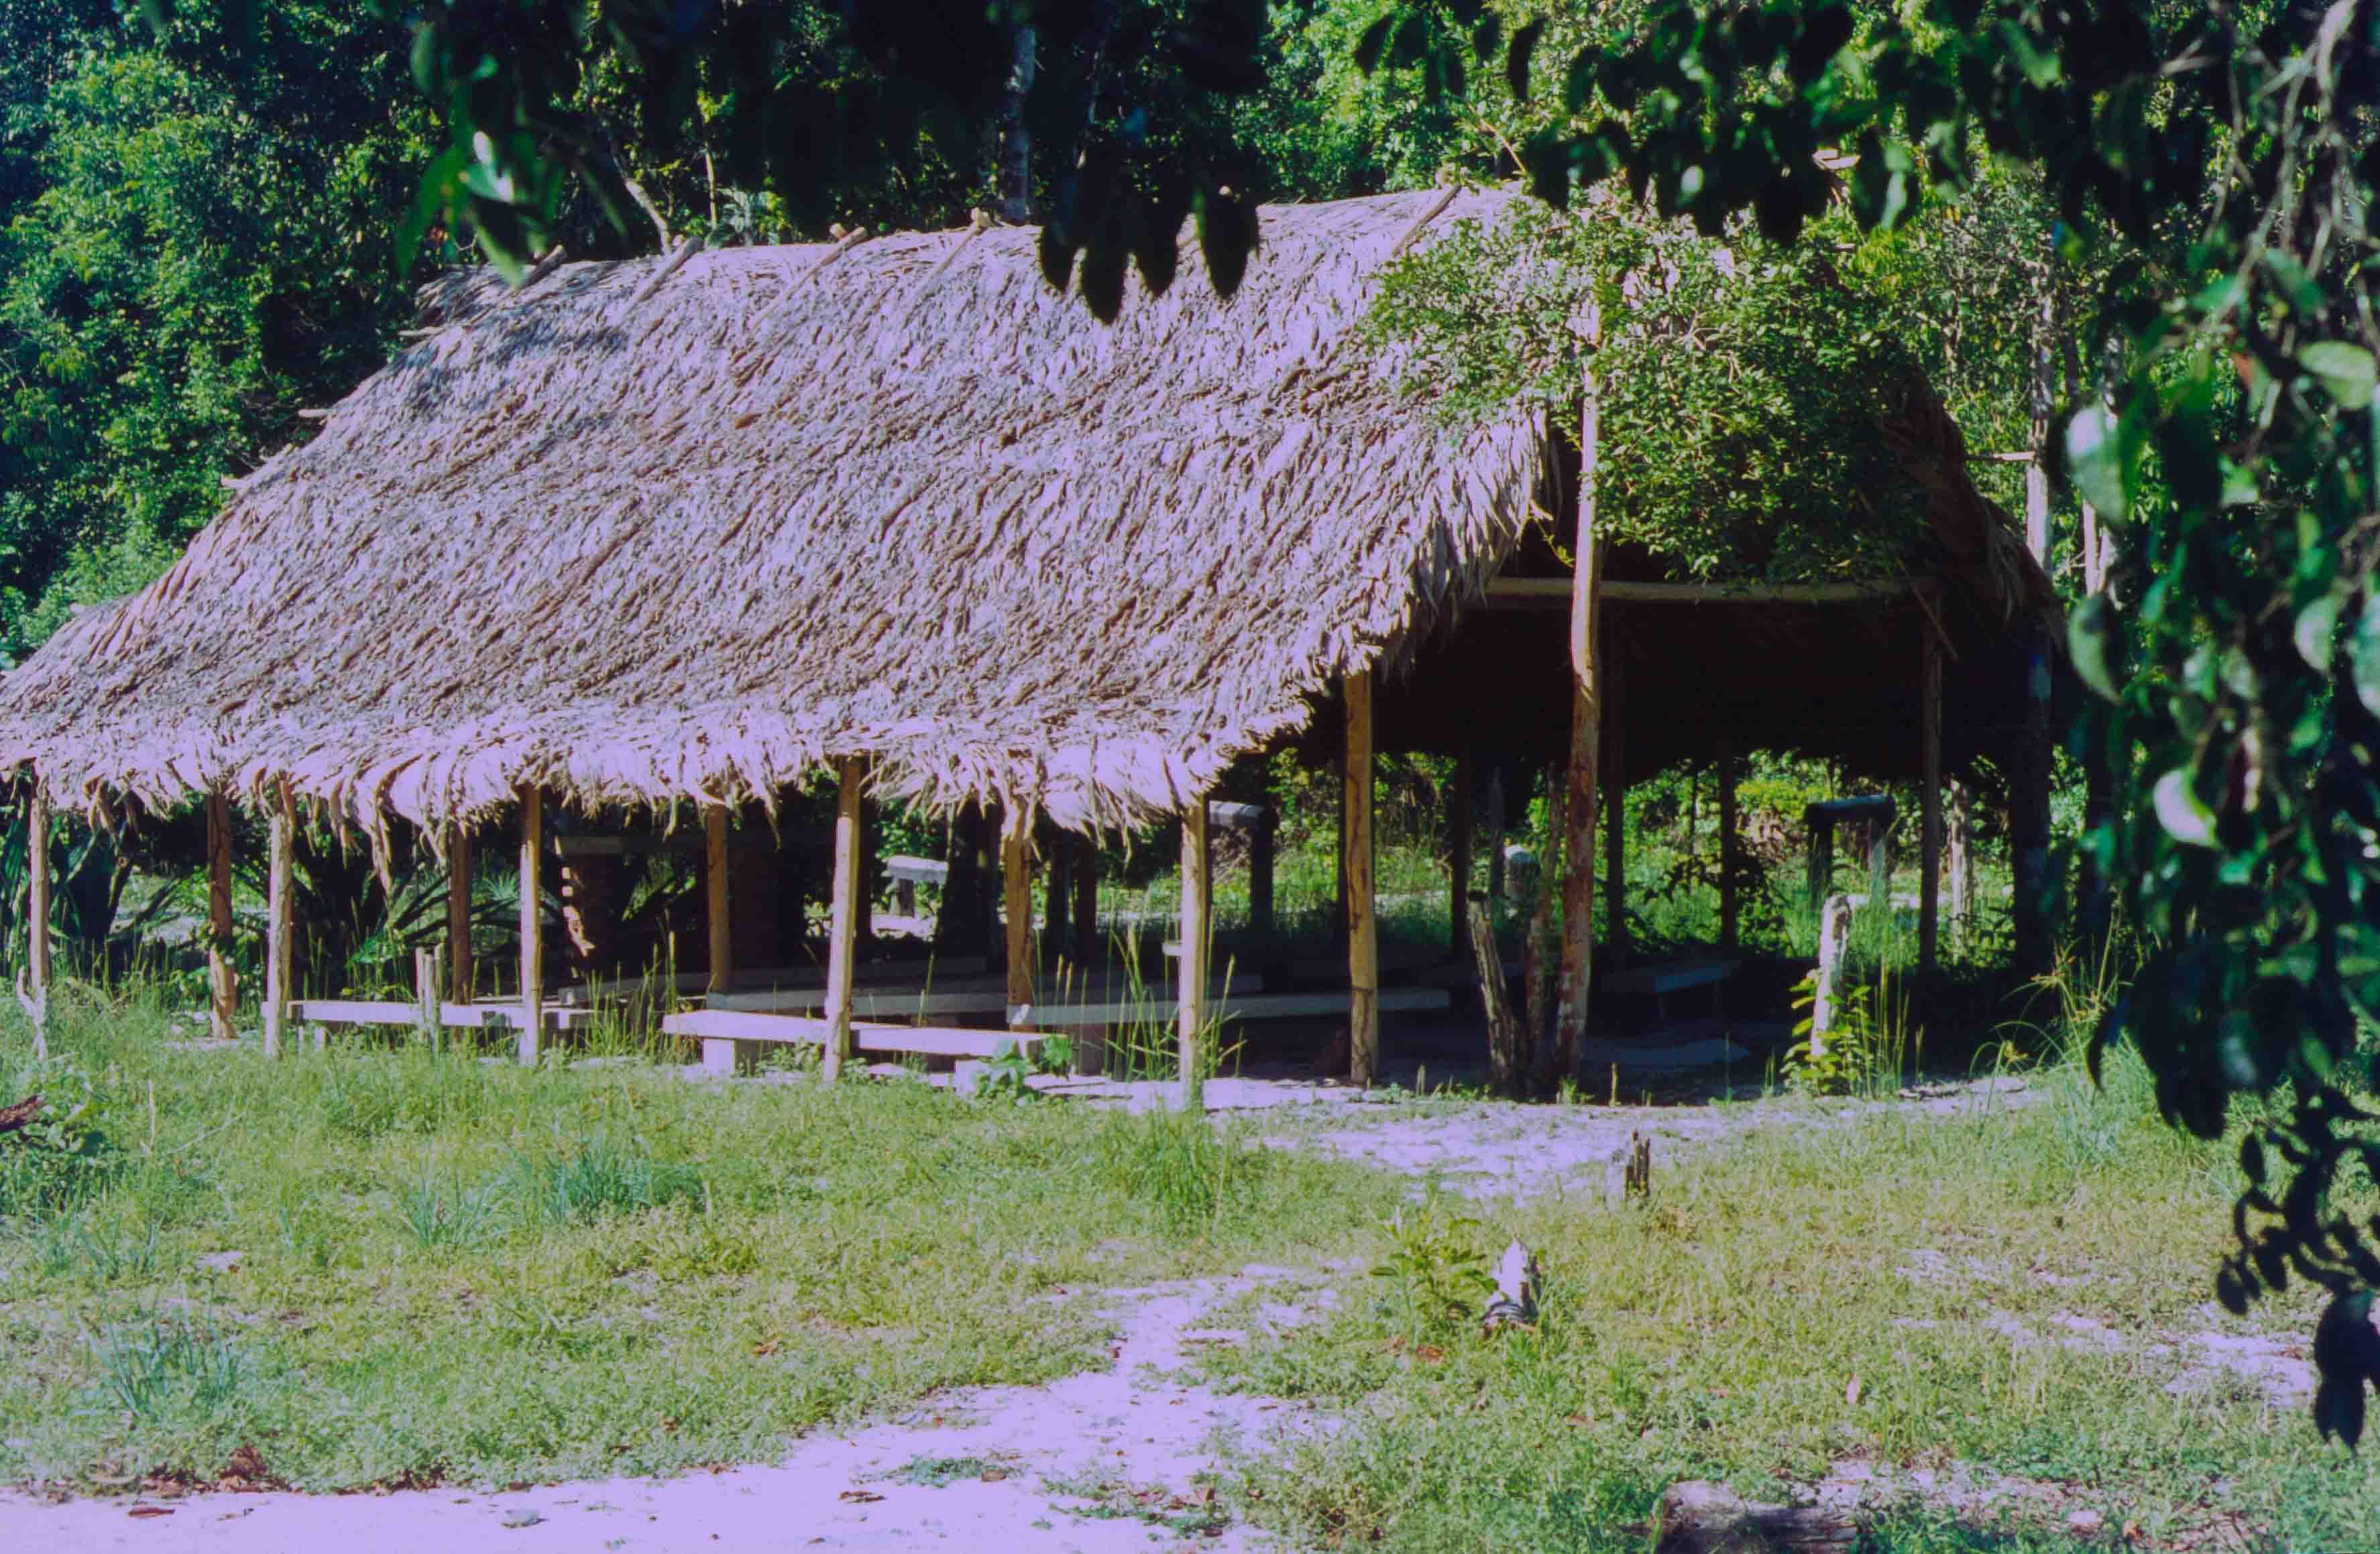 59. Suriname